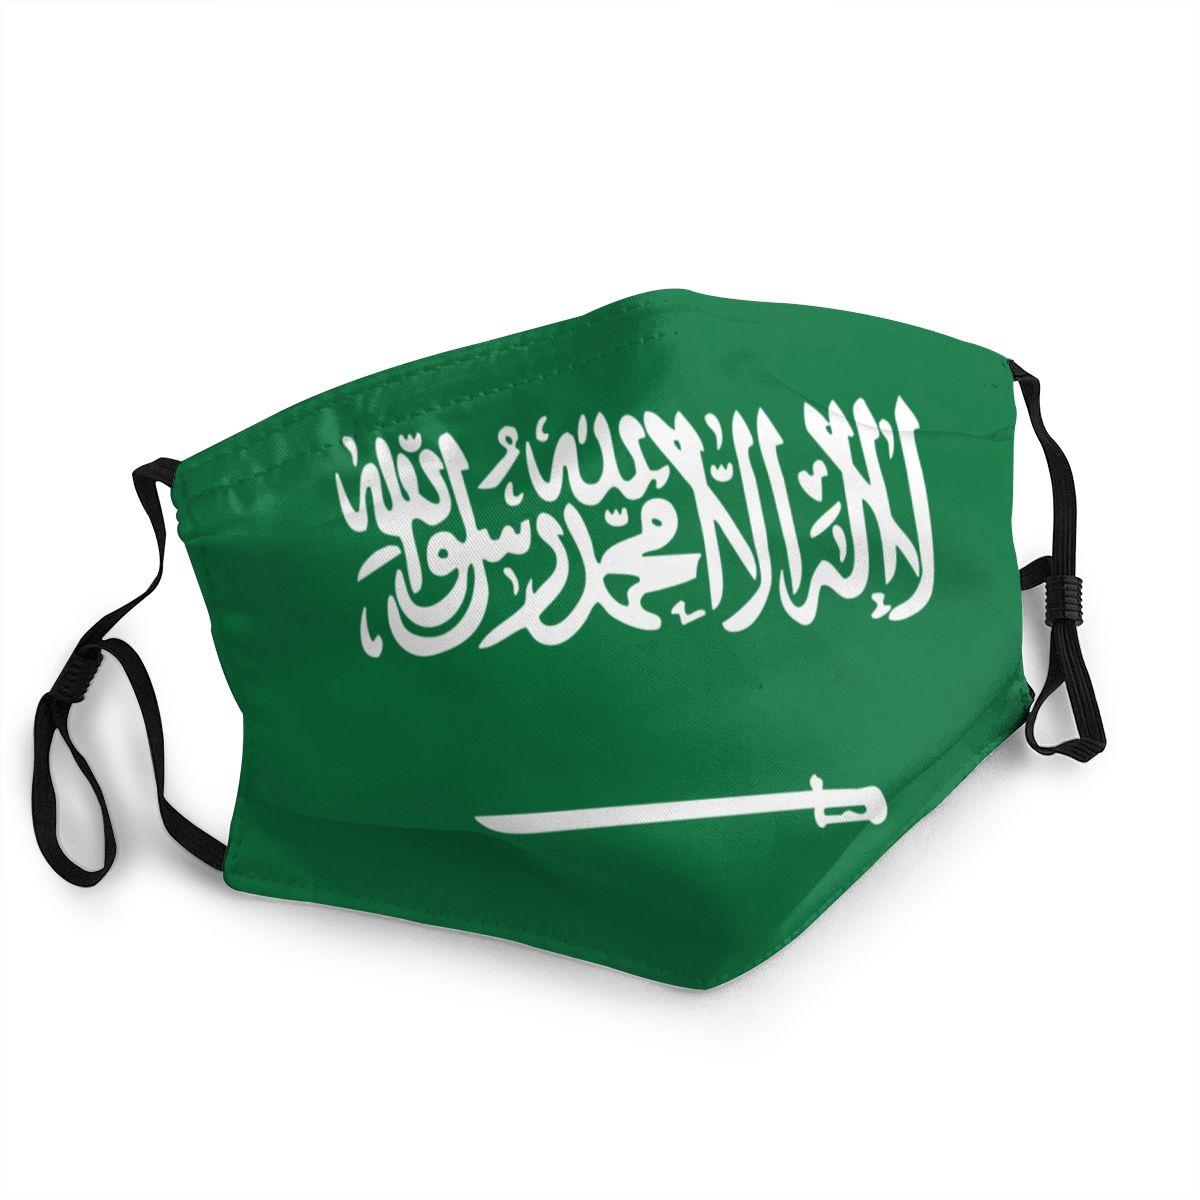 Saudi Arabia Flag Adult Non-Disposable Face Mask Anti Haze Dust Protection Cover Respirator